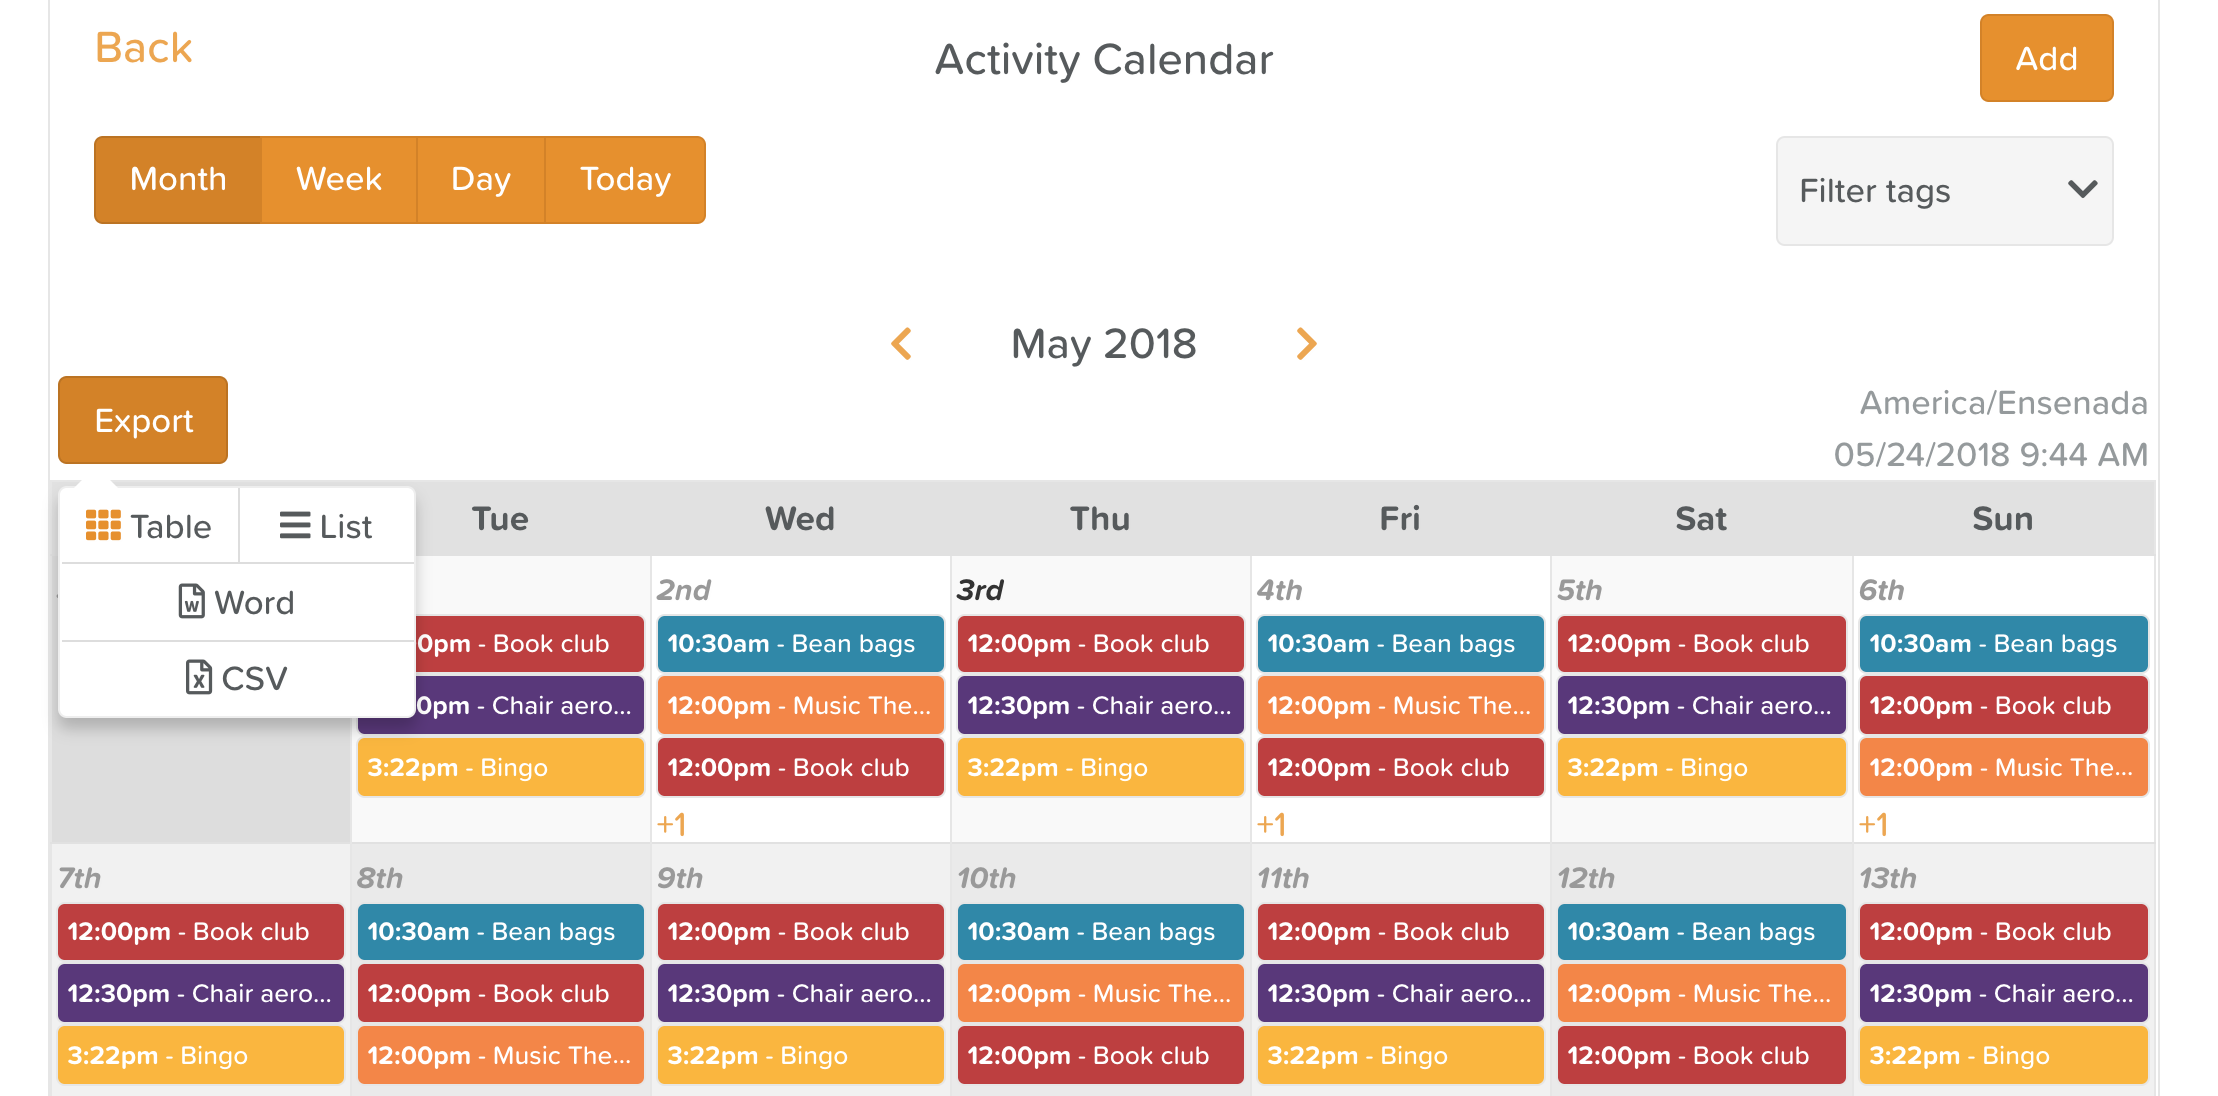 Activity Calendar Export